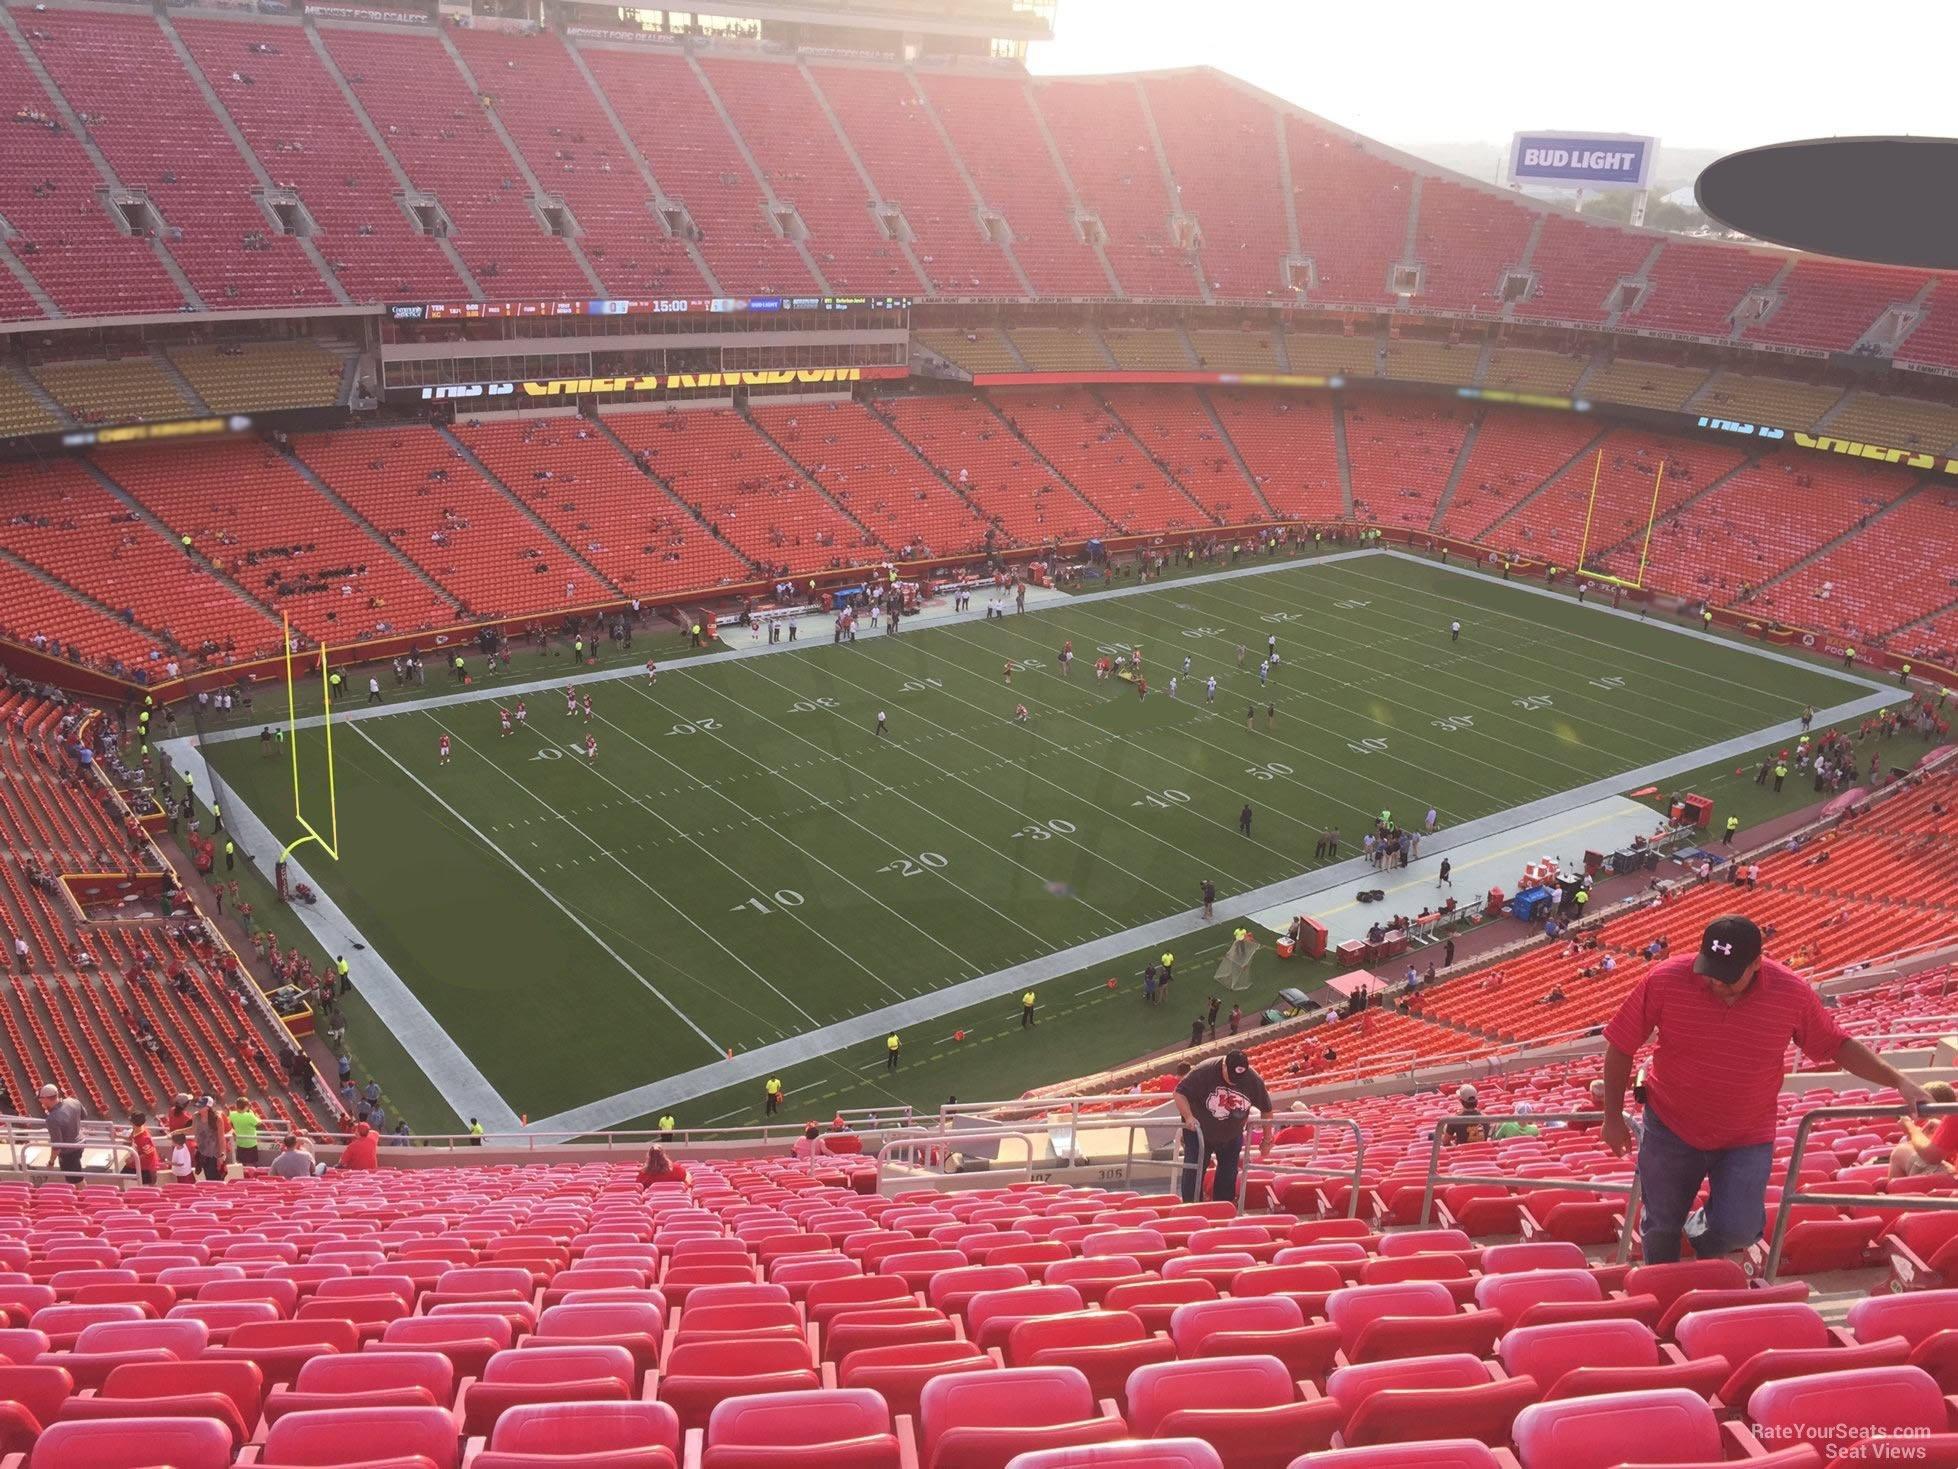 Arrowhead Stadium Section 307 - RateYourSeats.com